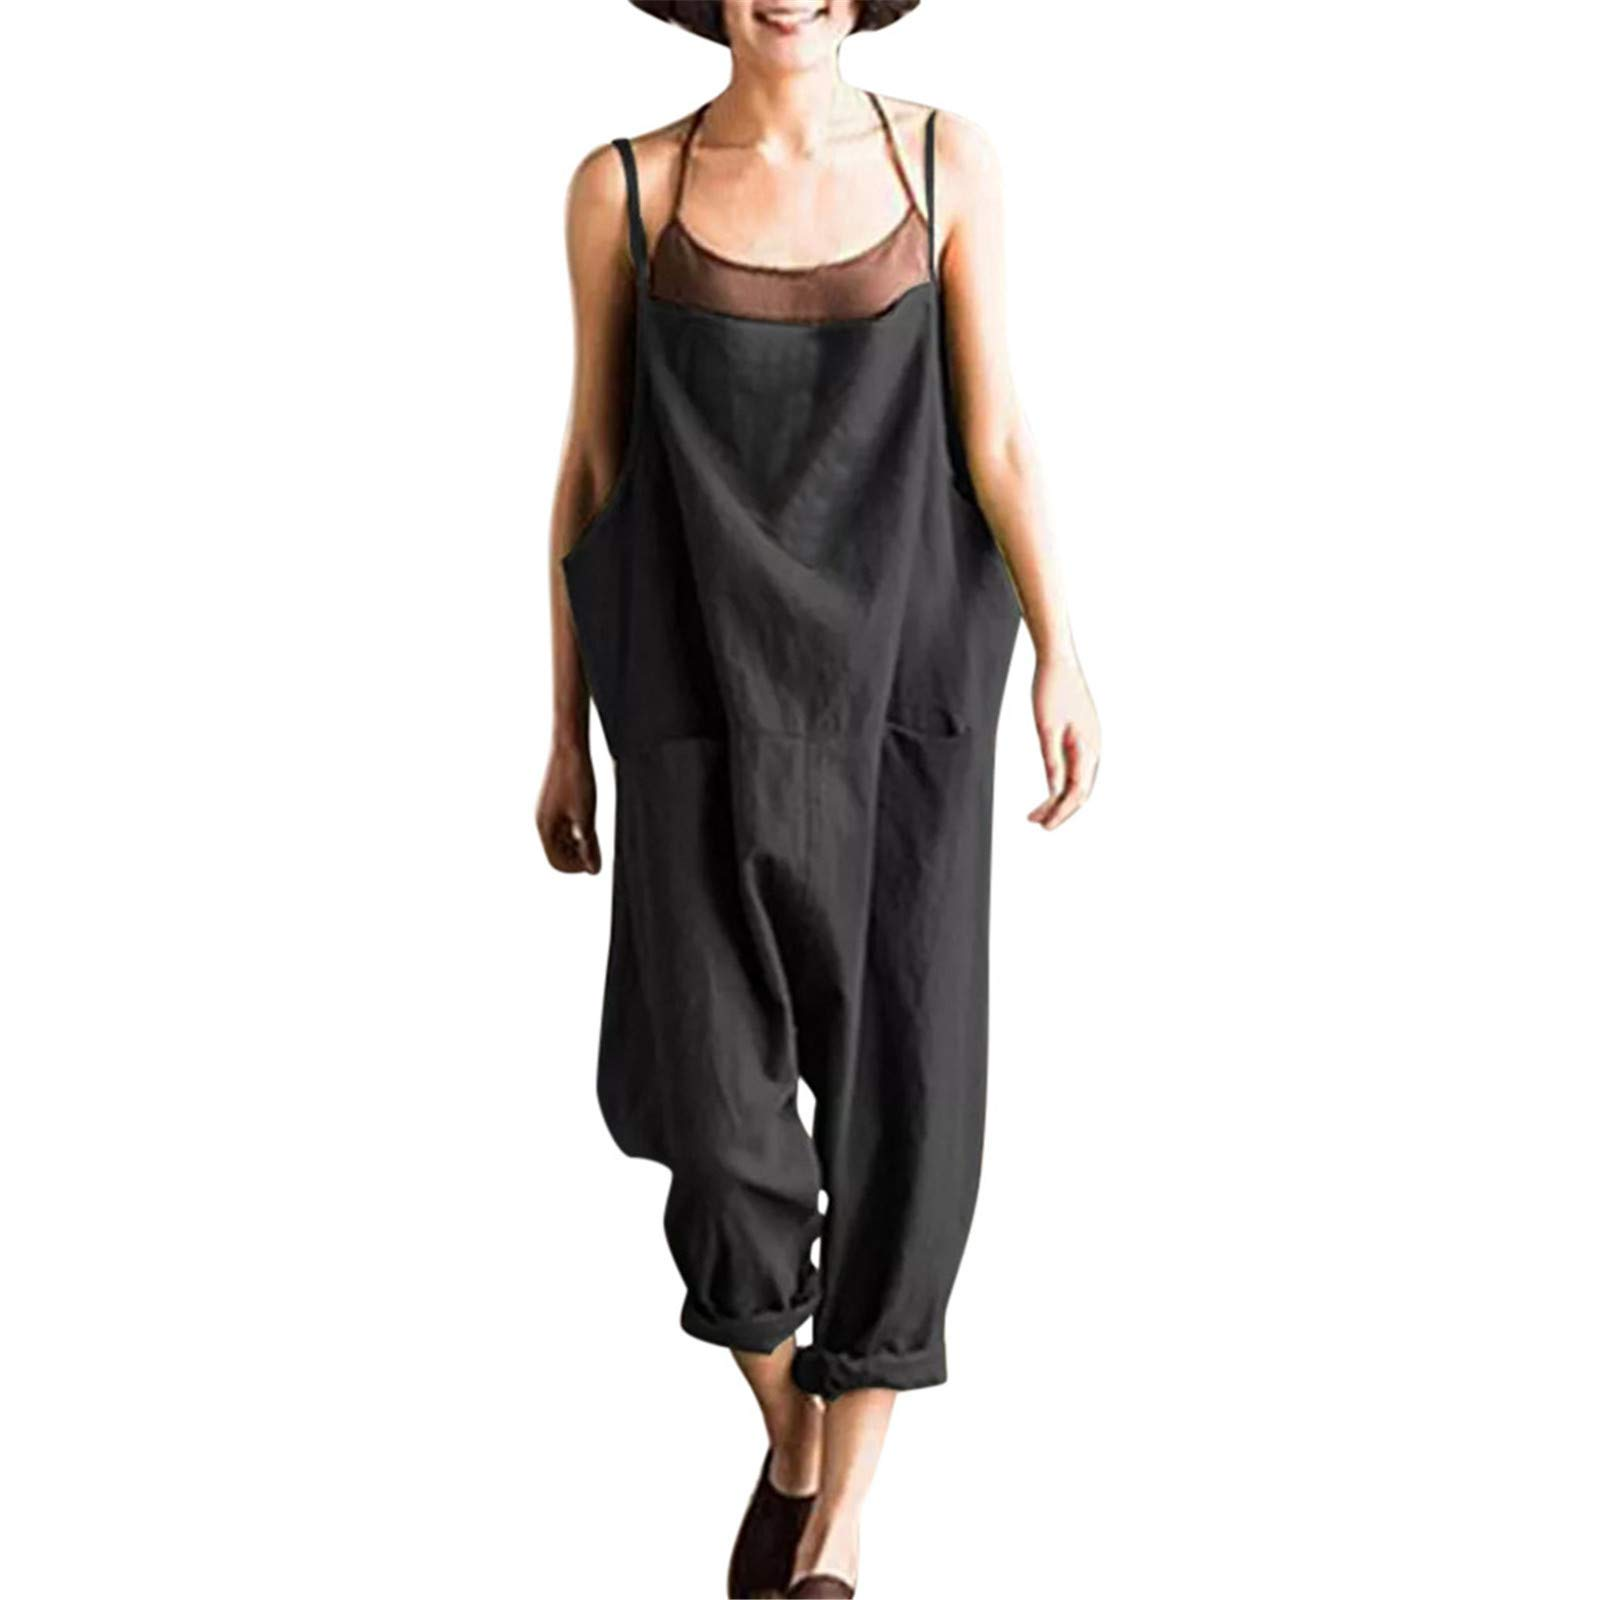 Thenxin Women's Baggy Overalls Spaghetti Straps Sleeveless Romper Hippie Long Pants Bib Dungarees(Black,M)